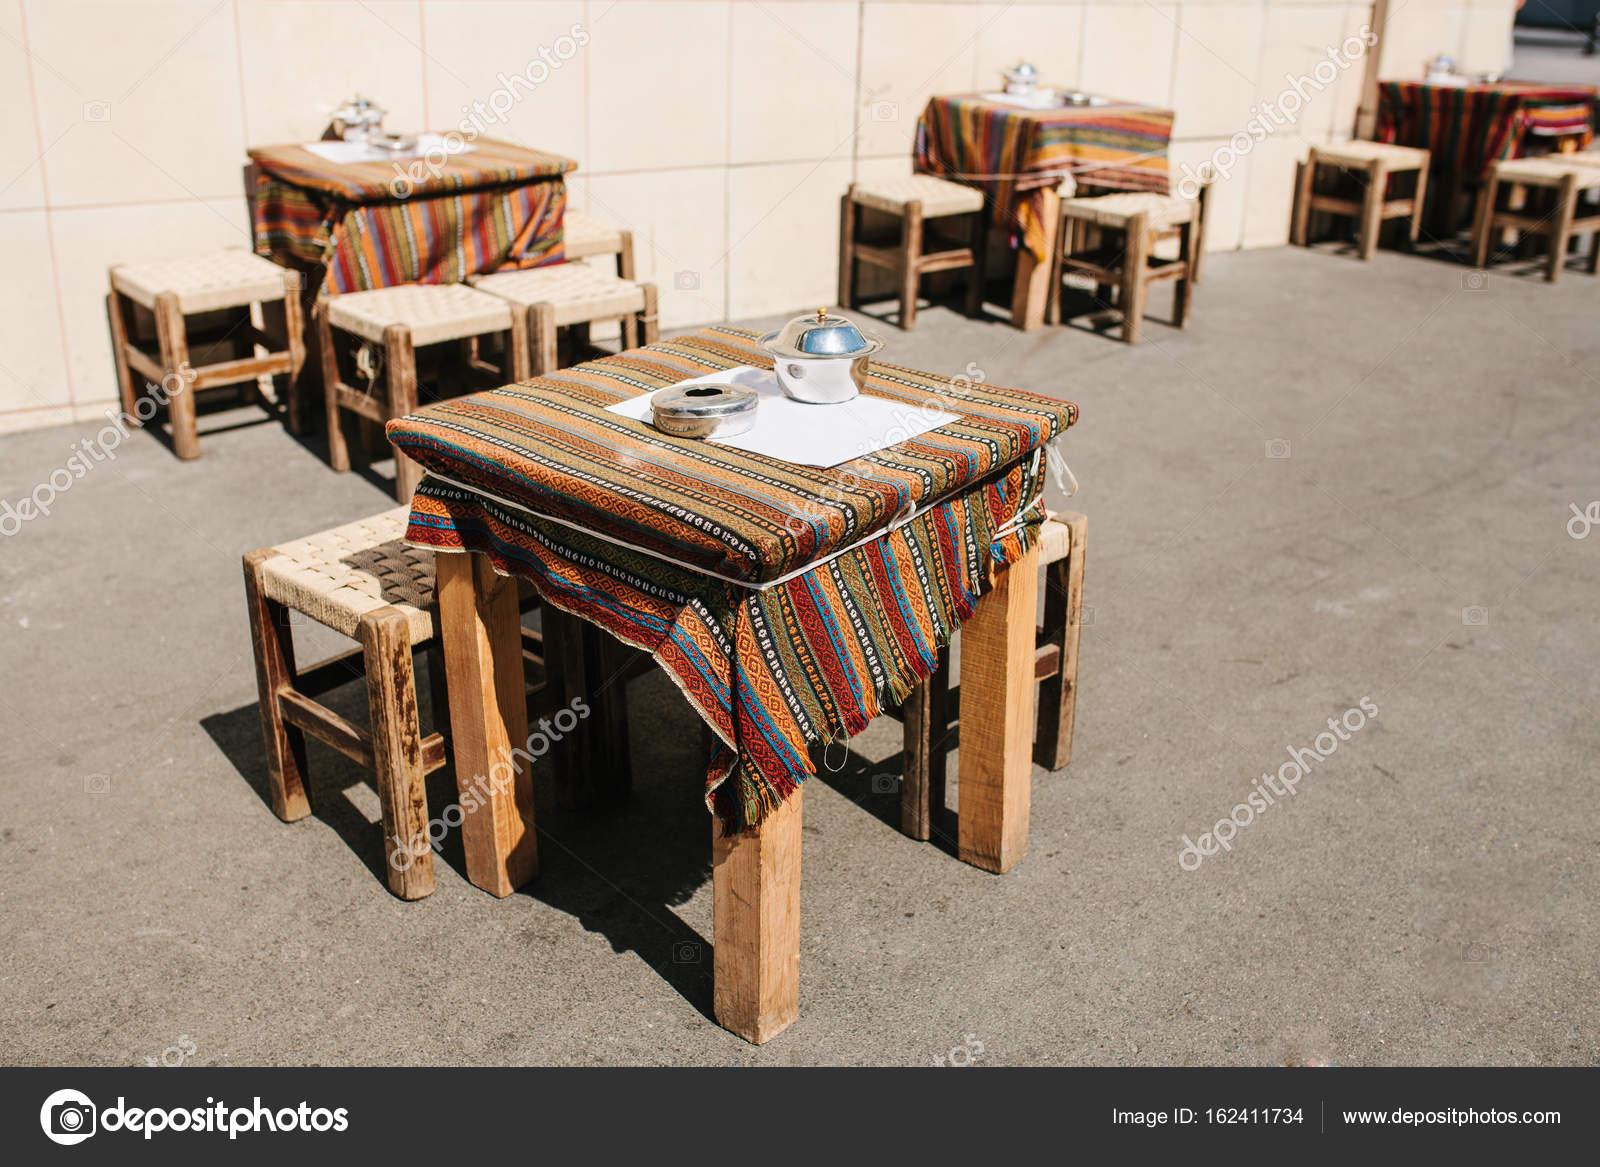 Café calle calle Turco en Estambul. Sillas y mesas de madera están ...